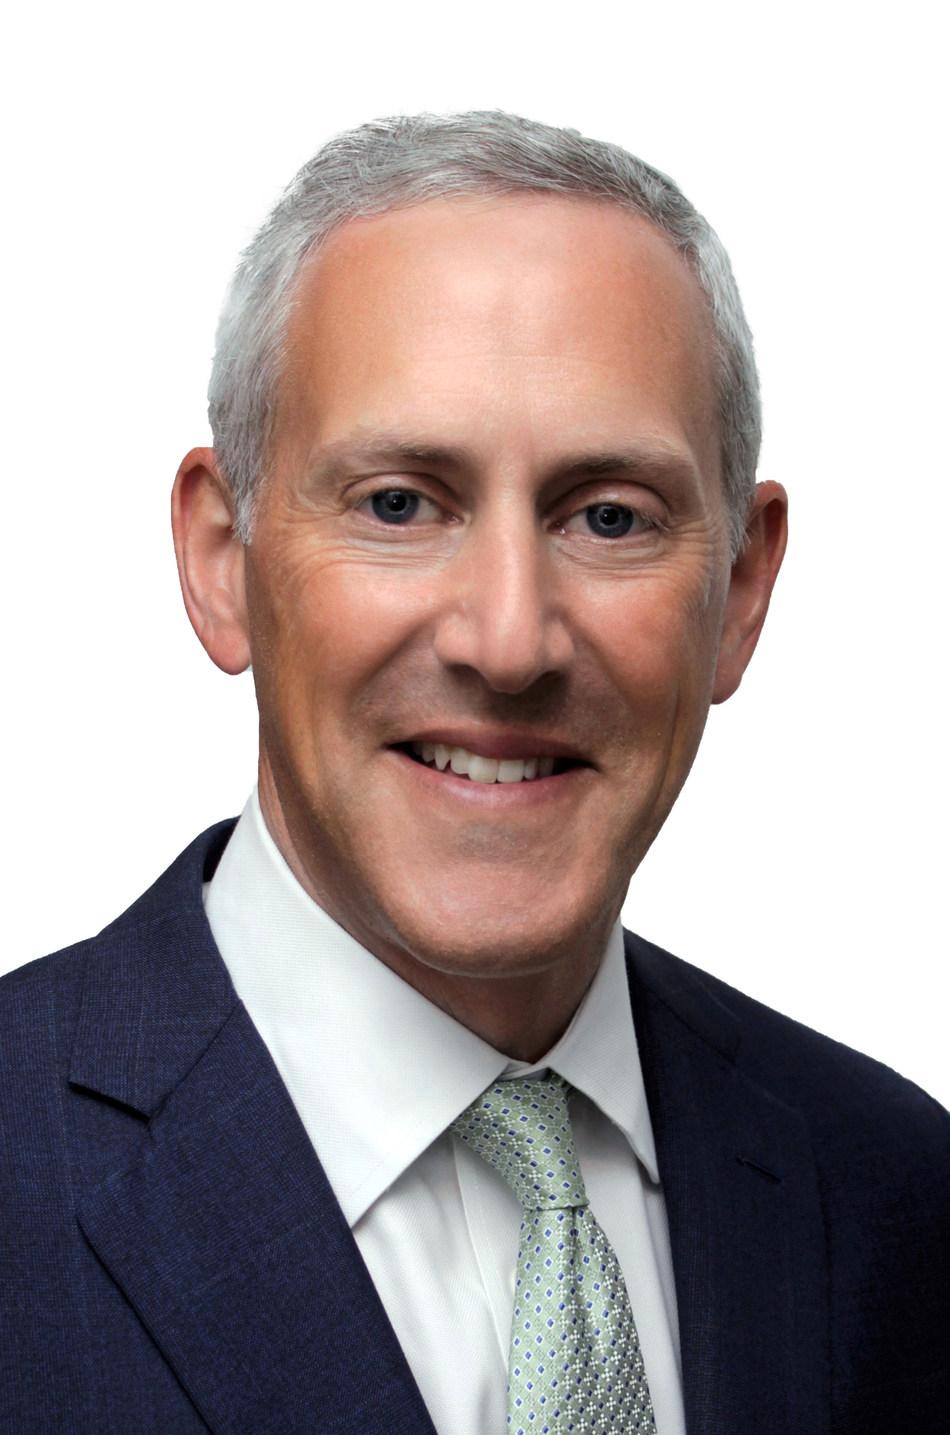 Kenneth M. Shimberg, CFA, Managing Director, Strategic Investment Group